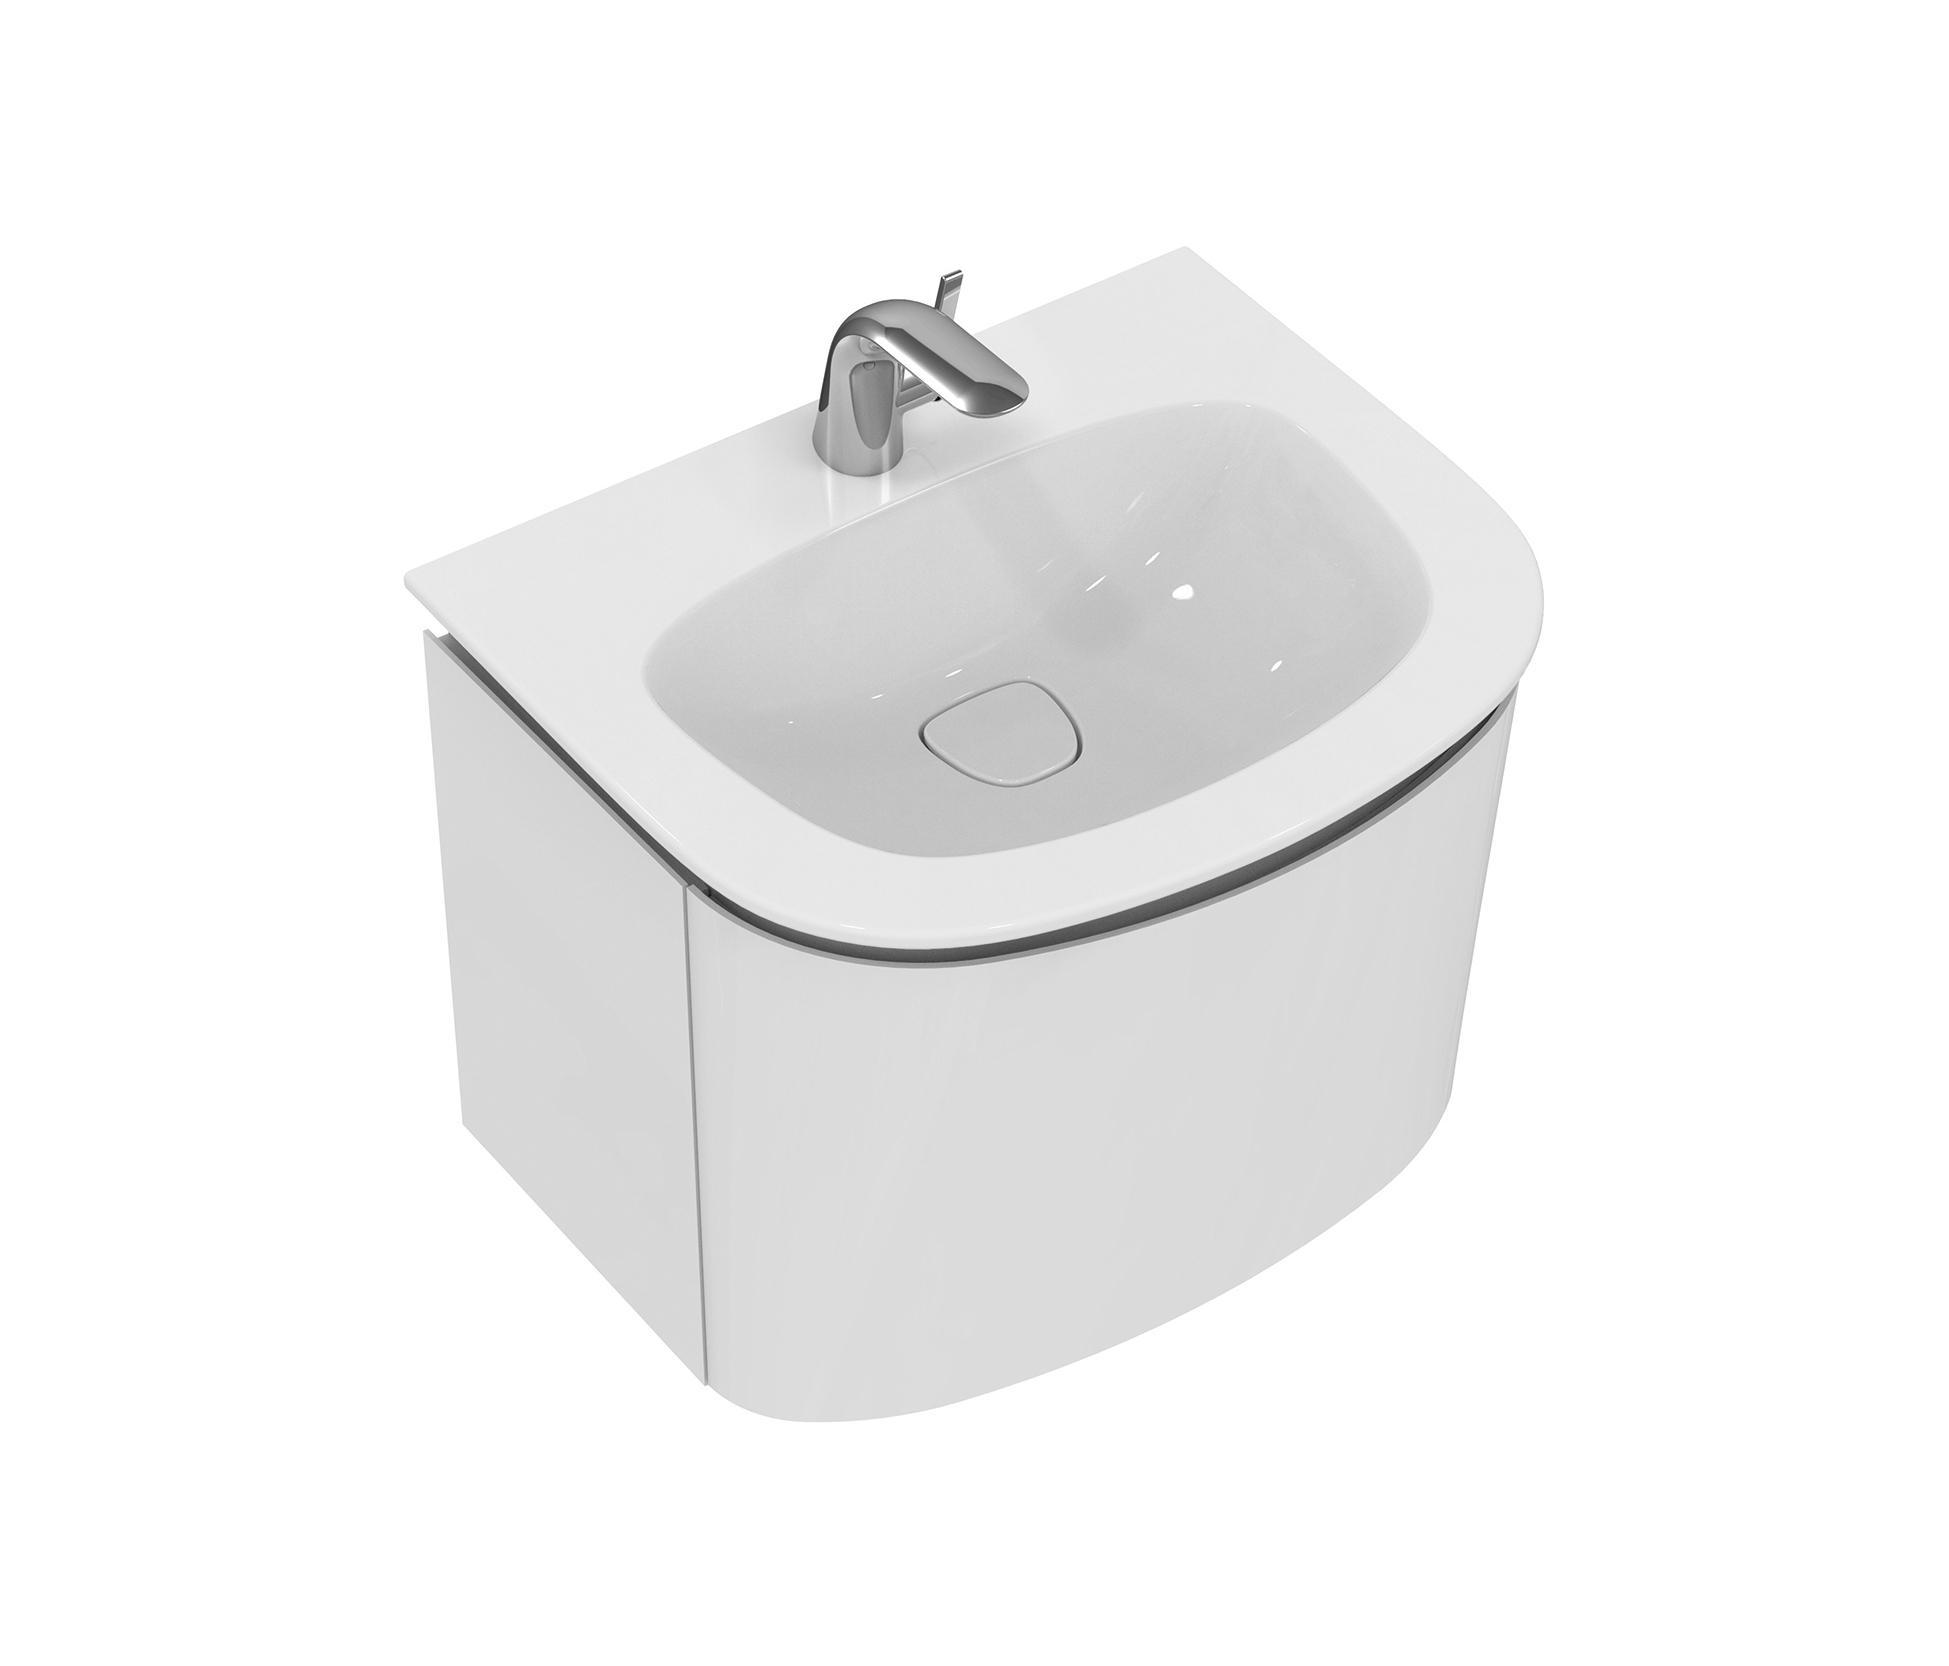 dea waschtisch unterschrank 600mm wash basins from ideal standard architonic. Black Bedroom Furniture Sets. Home Design Ideas